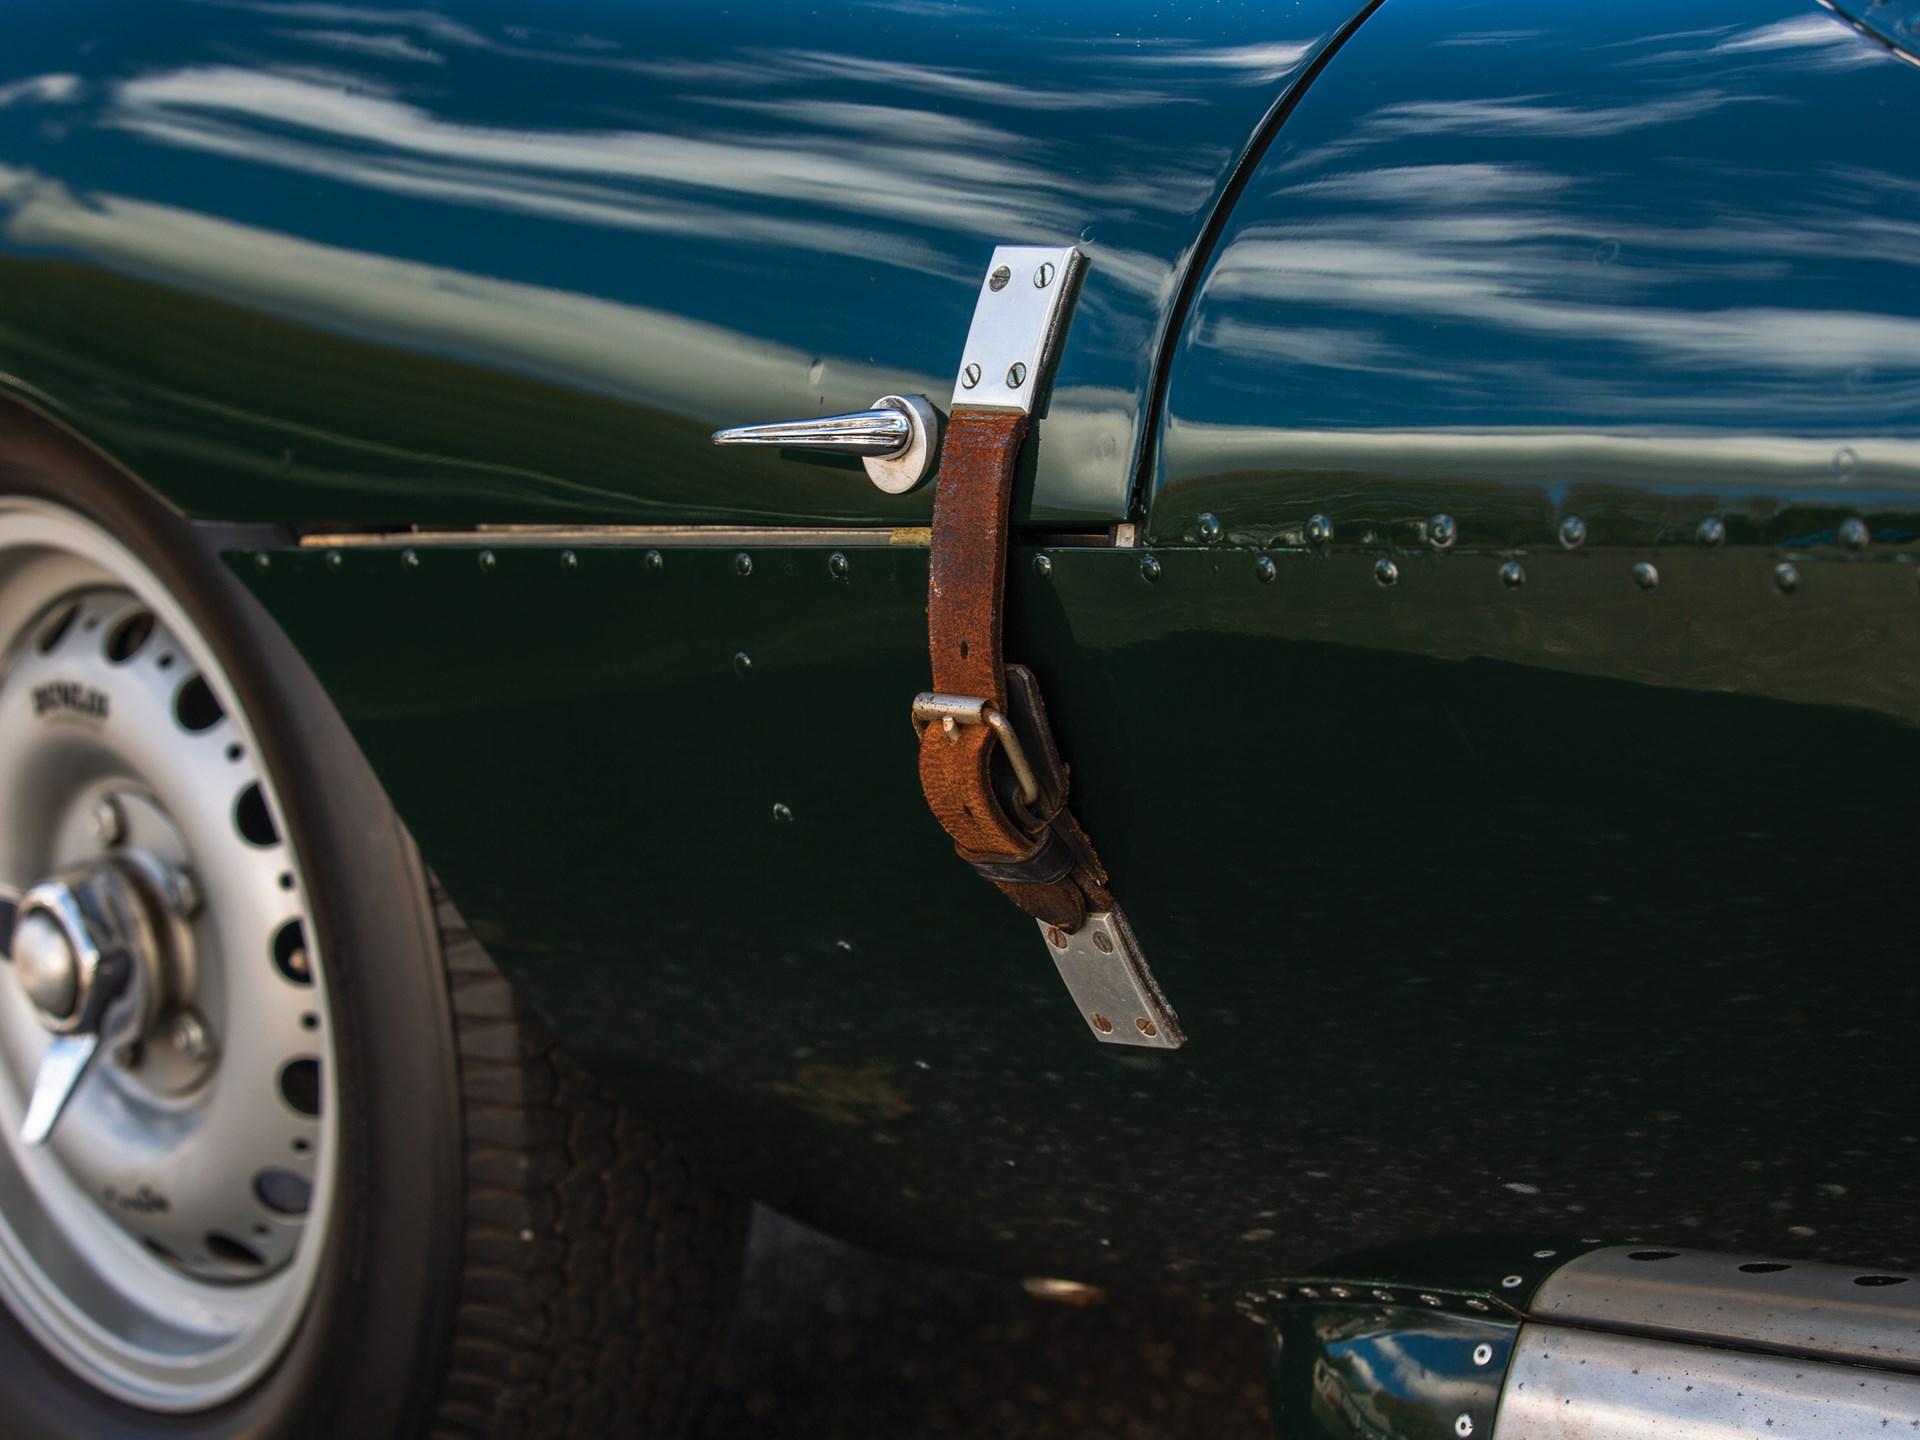 1969 Jaguar XKSS Recreation by Lynx